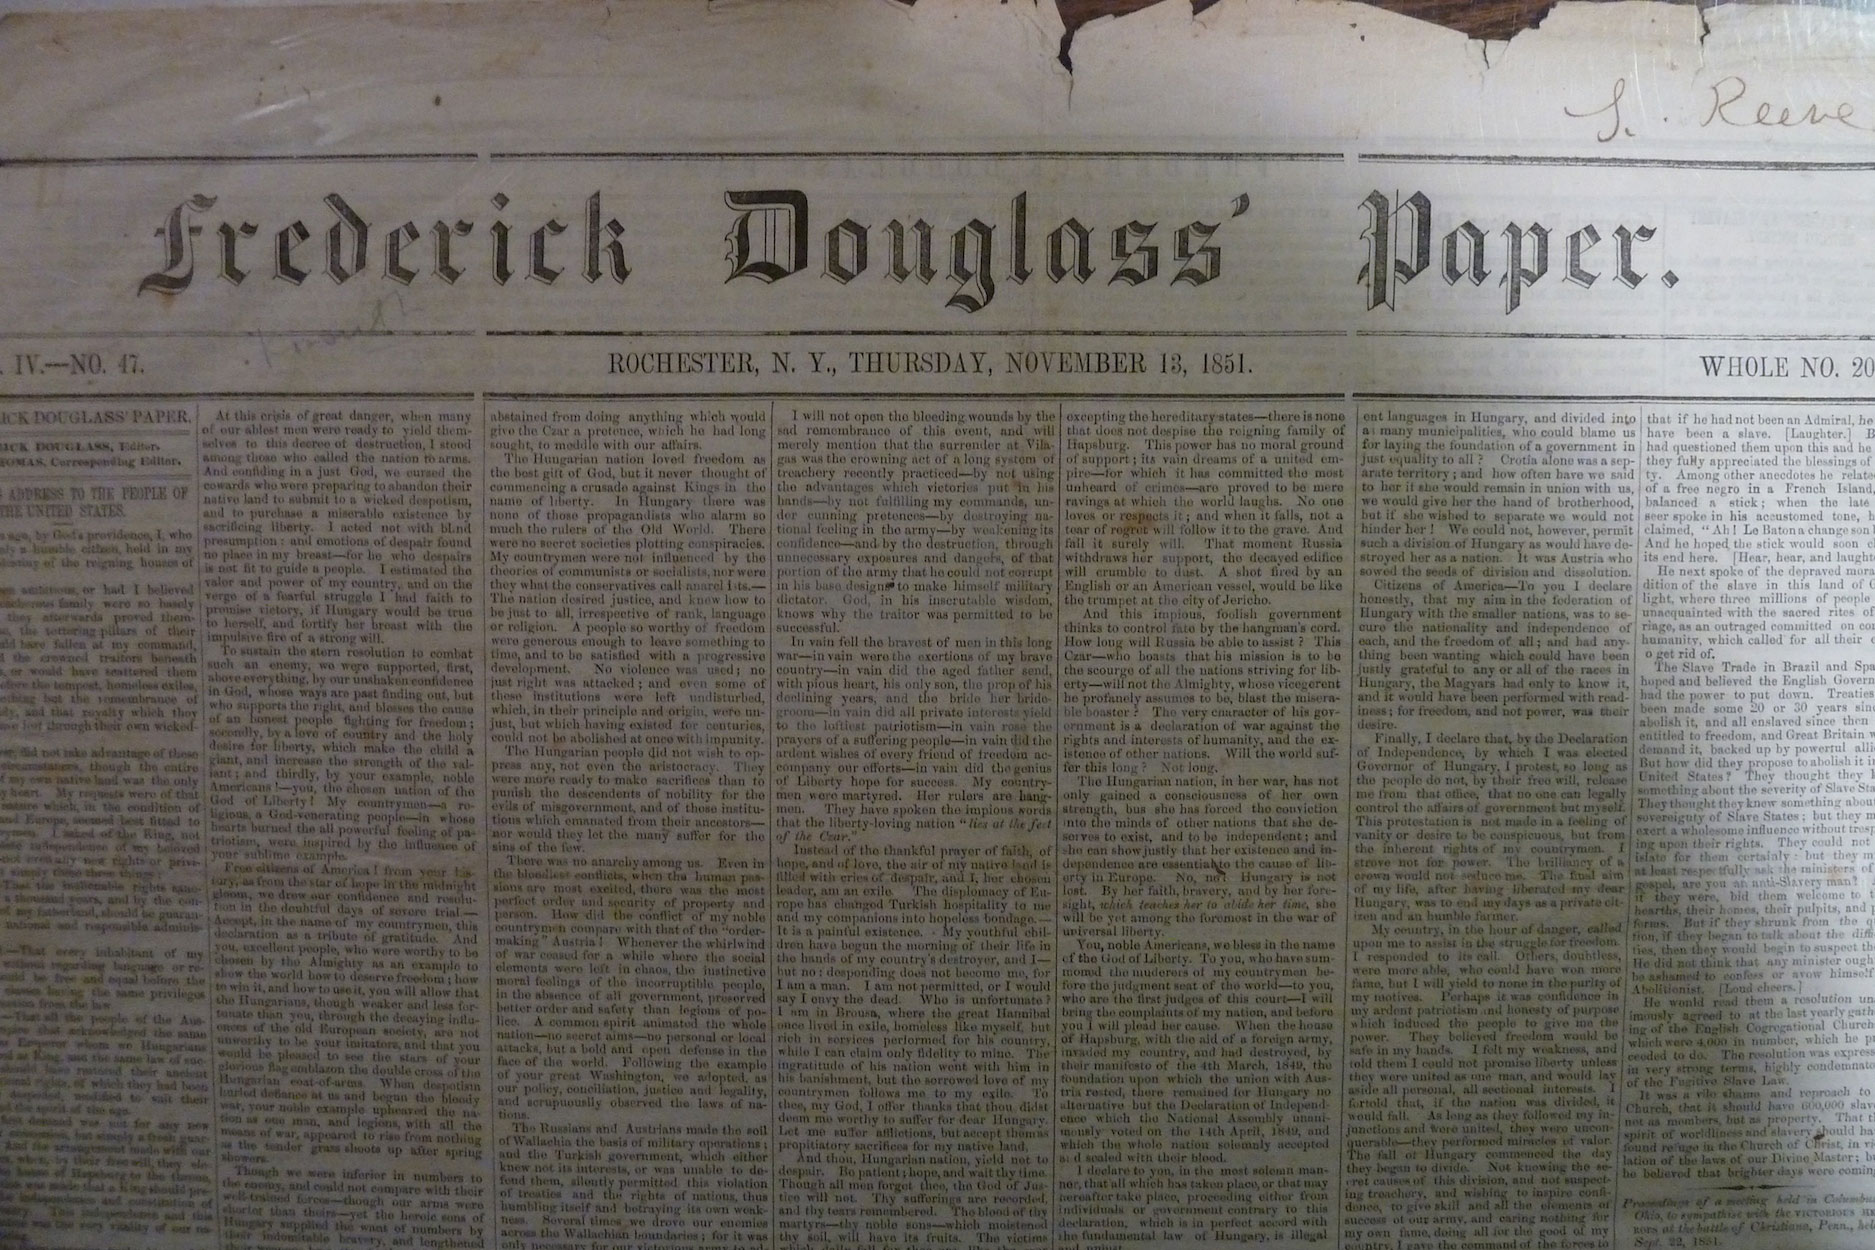 Frederick Douglass' Paper